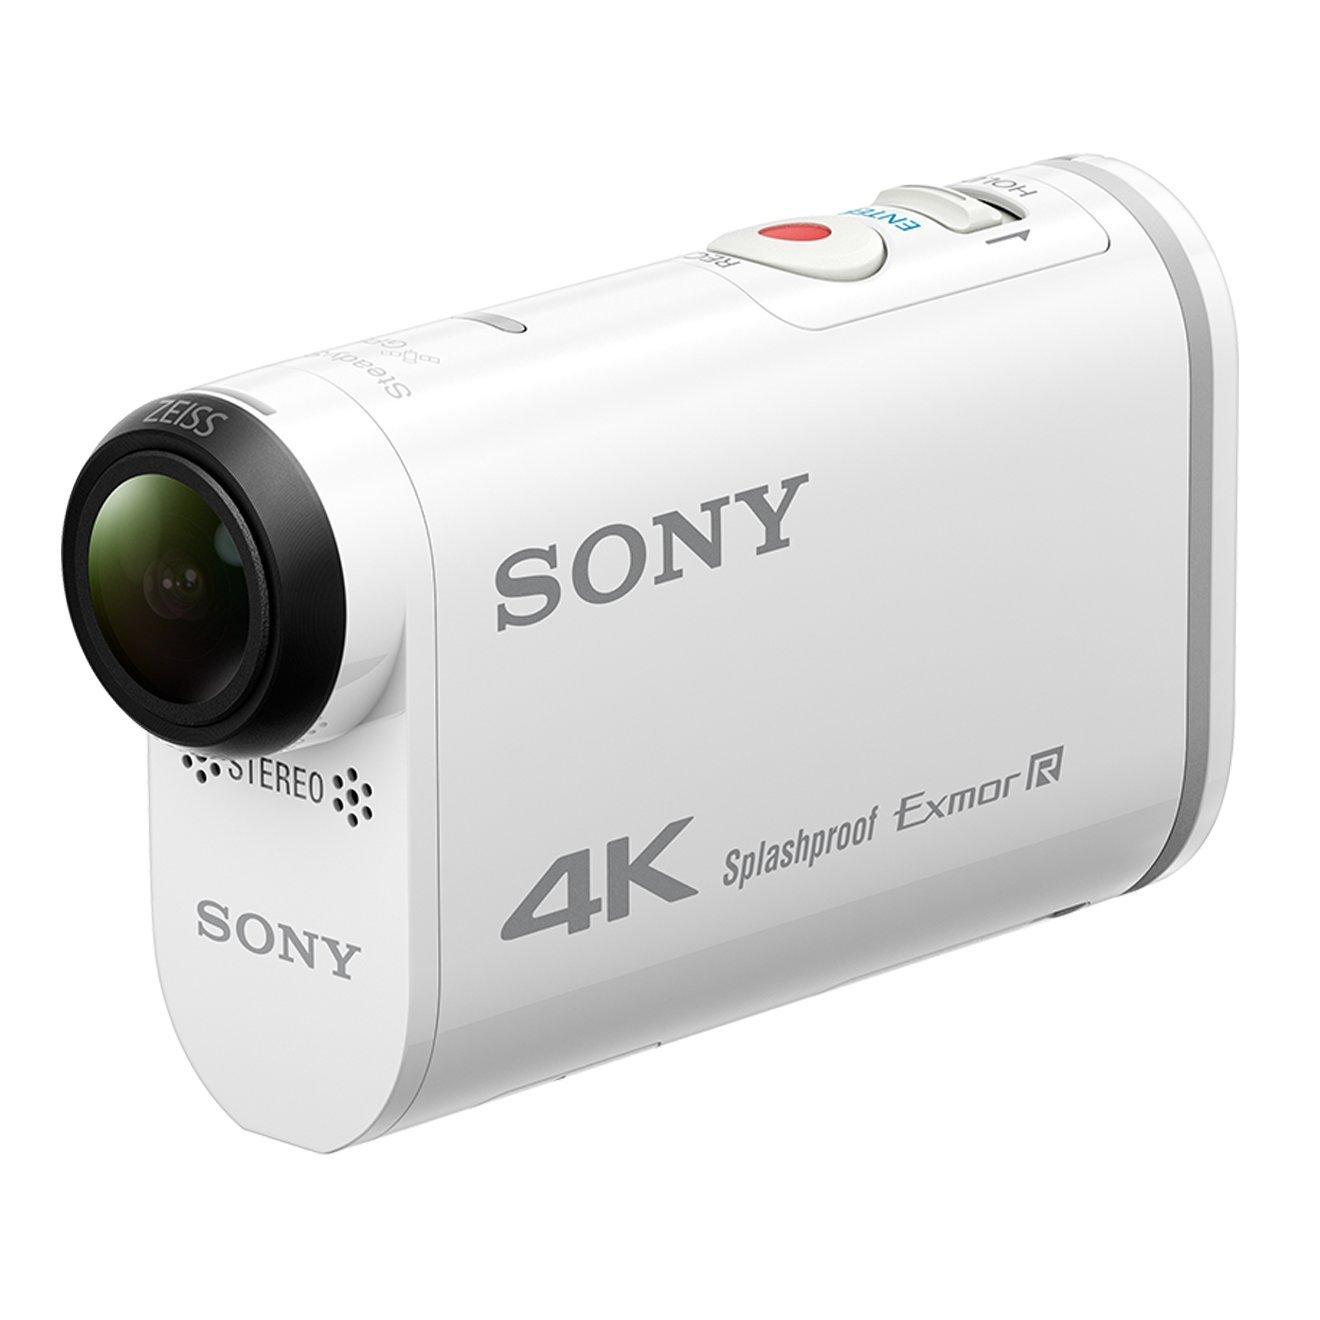 Sony Action Cam FDR-X1000V - Videocámara deportiva (video 4K, resistente a salpicaduras con WI-FI, NFC, GPS y funda resistente al agua), blanco